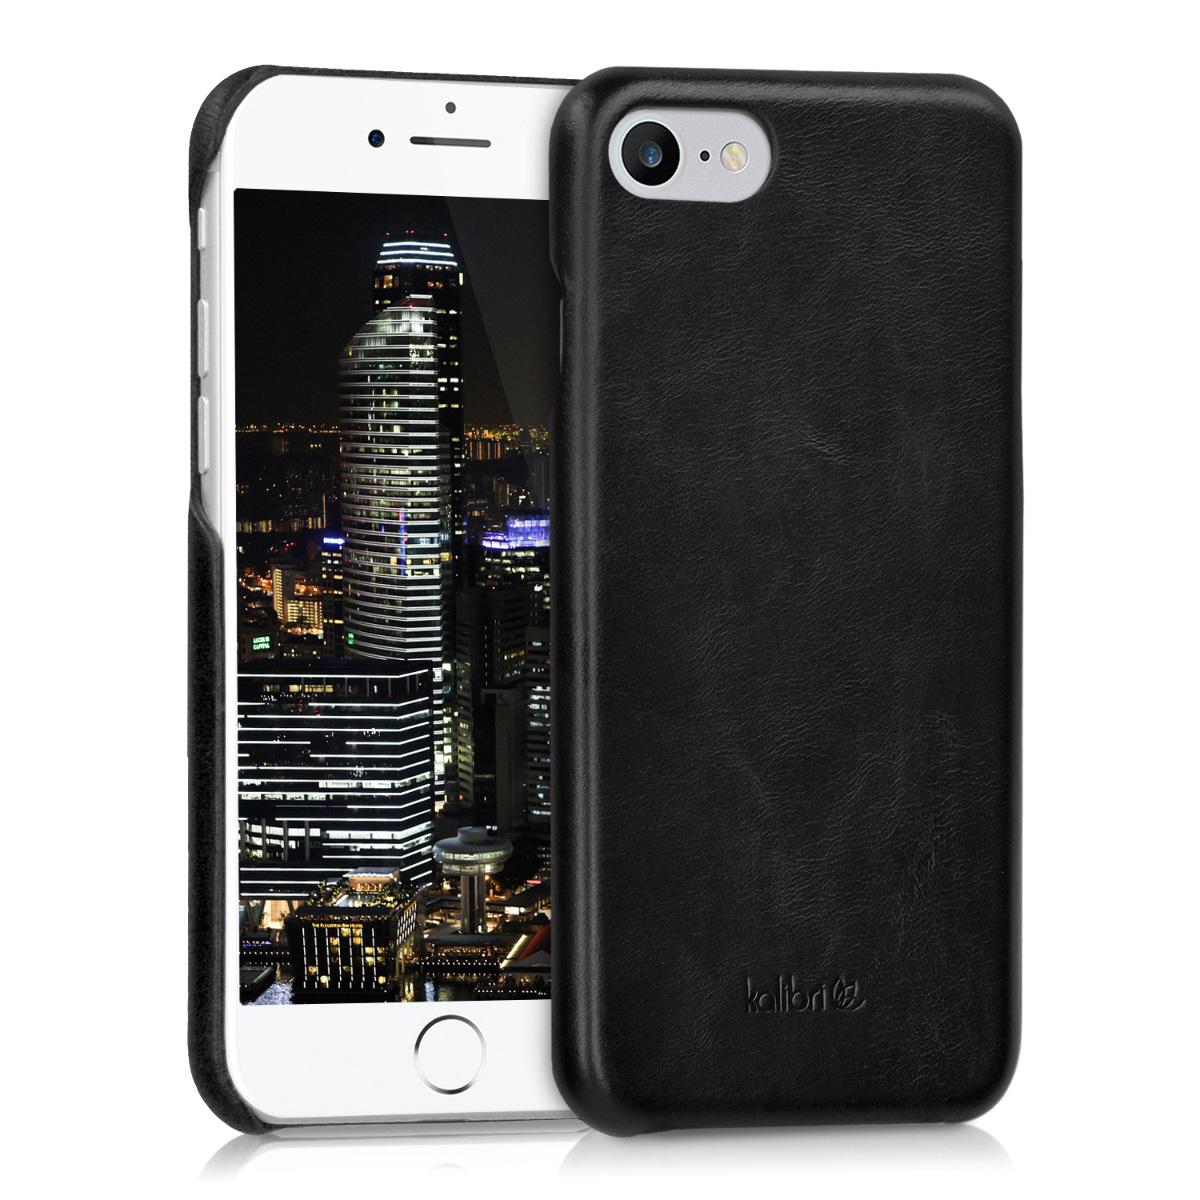 Kalibri Σκληρή Δερμάτινη Θήκη iPhone 8 / 7 - Black (39345.01)